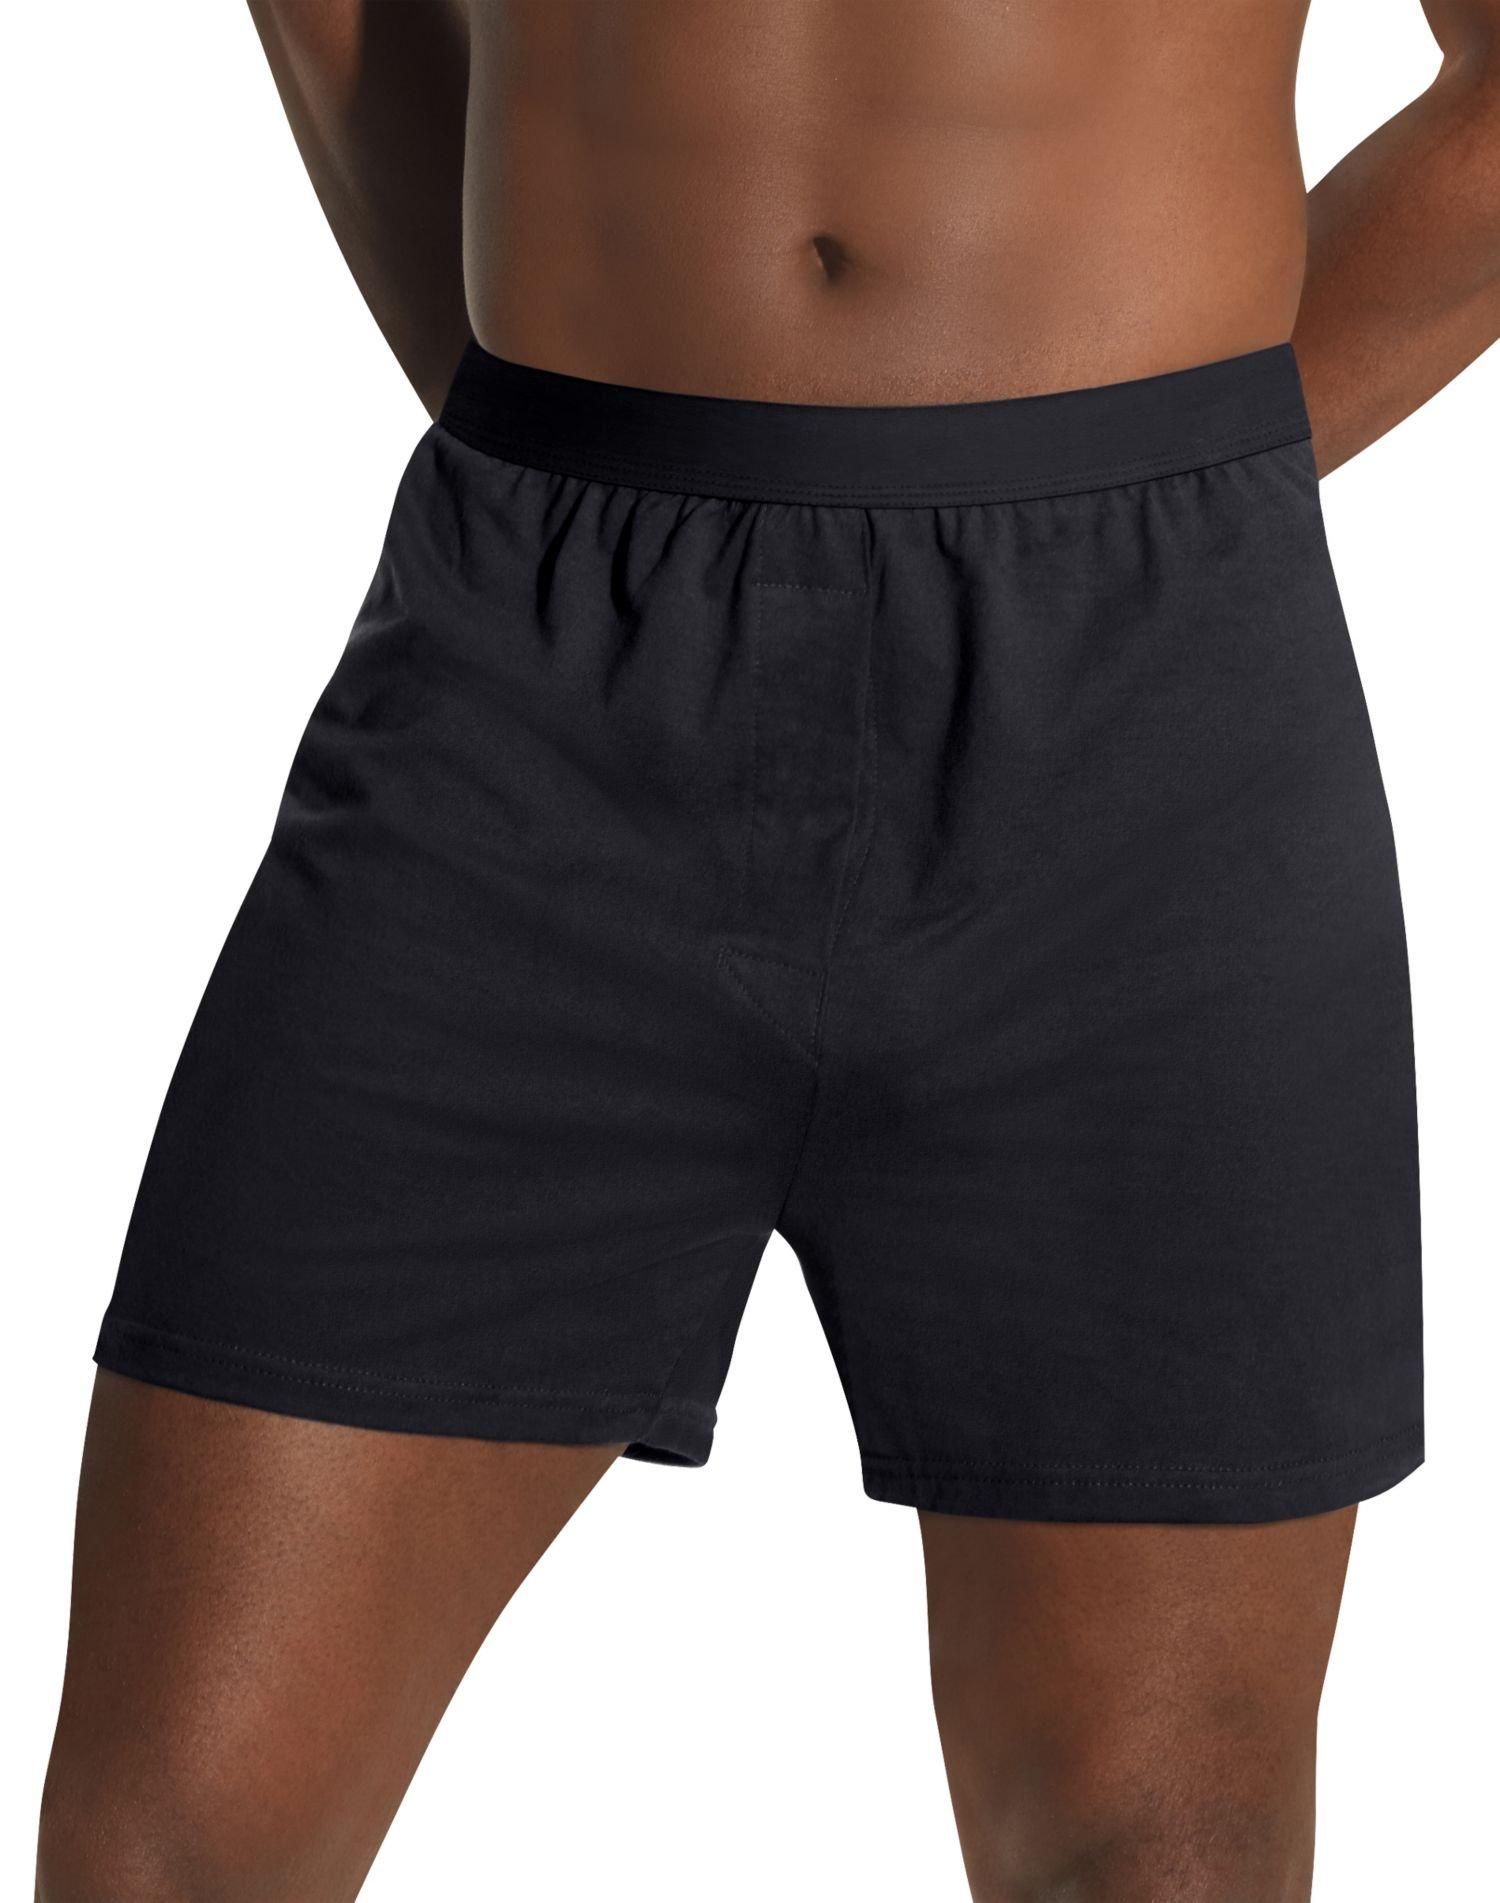 Hanes Tagless Big Men's 3-Pack Knit Boxers